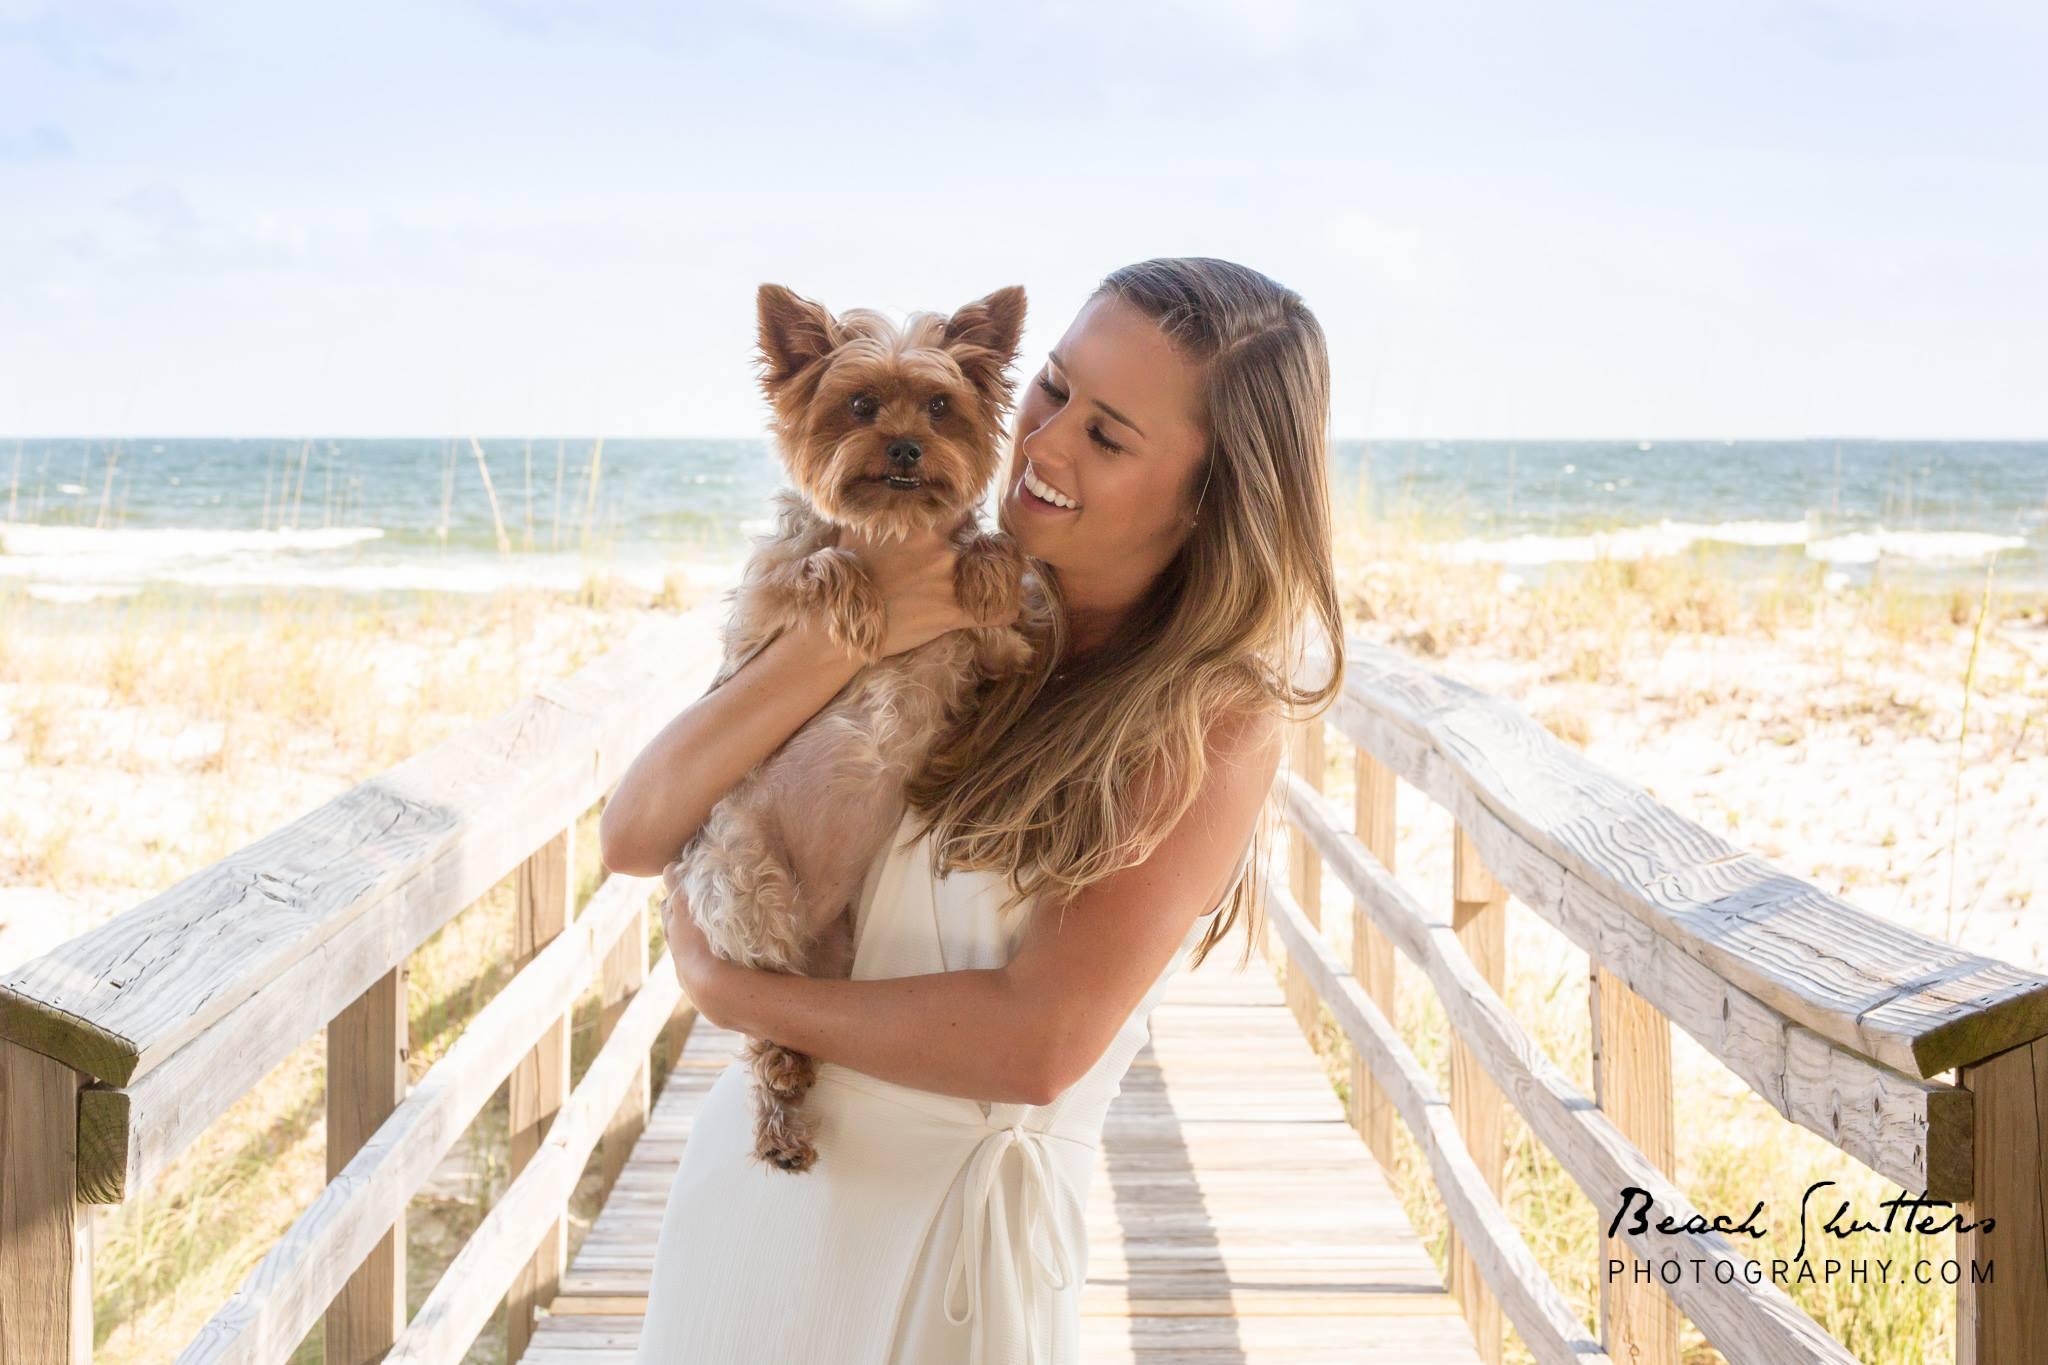 Pet friendly photographer in Alabama